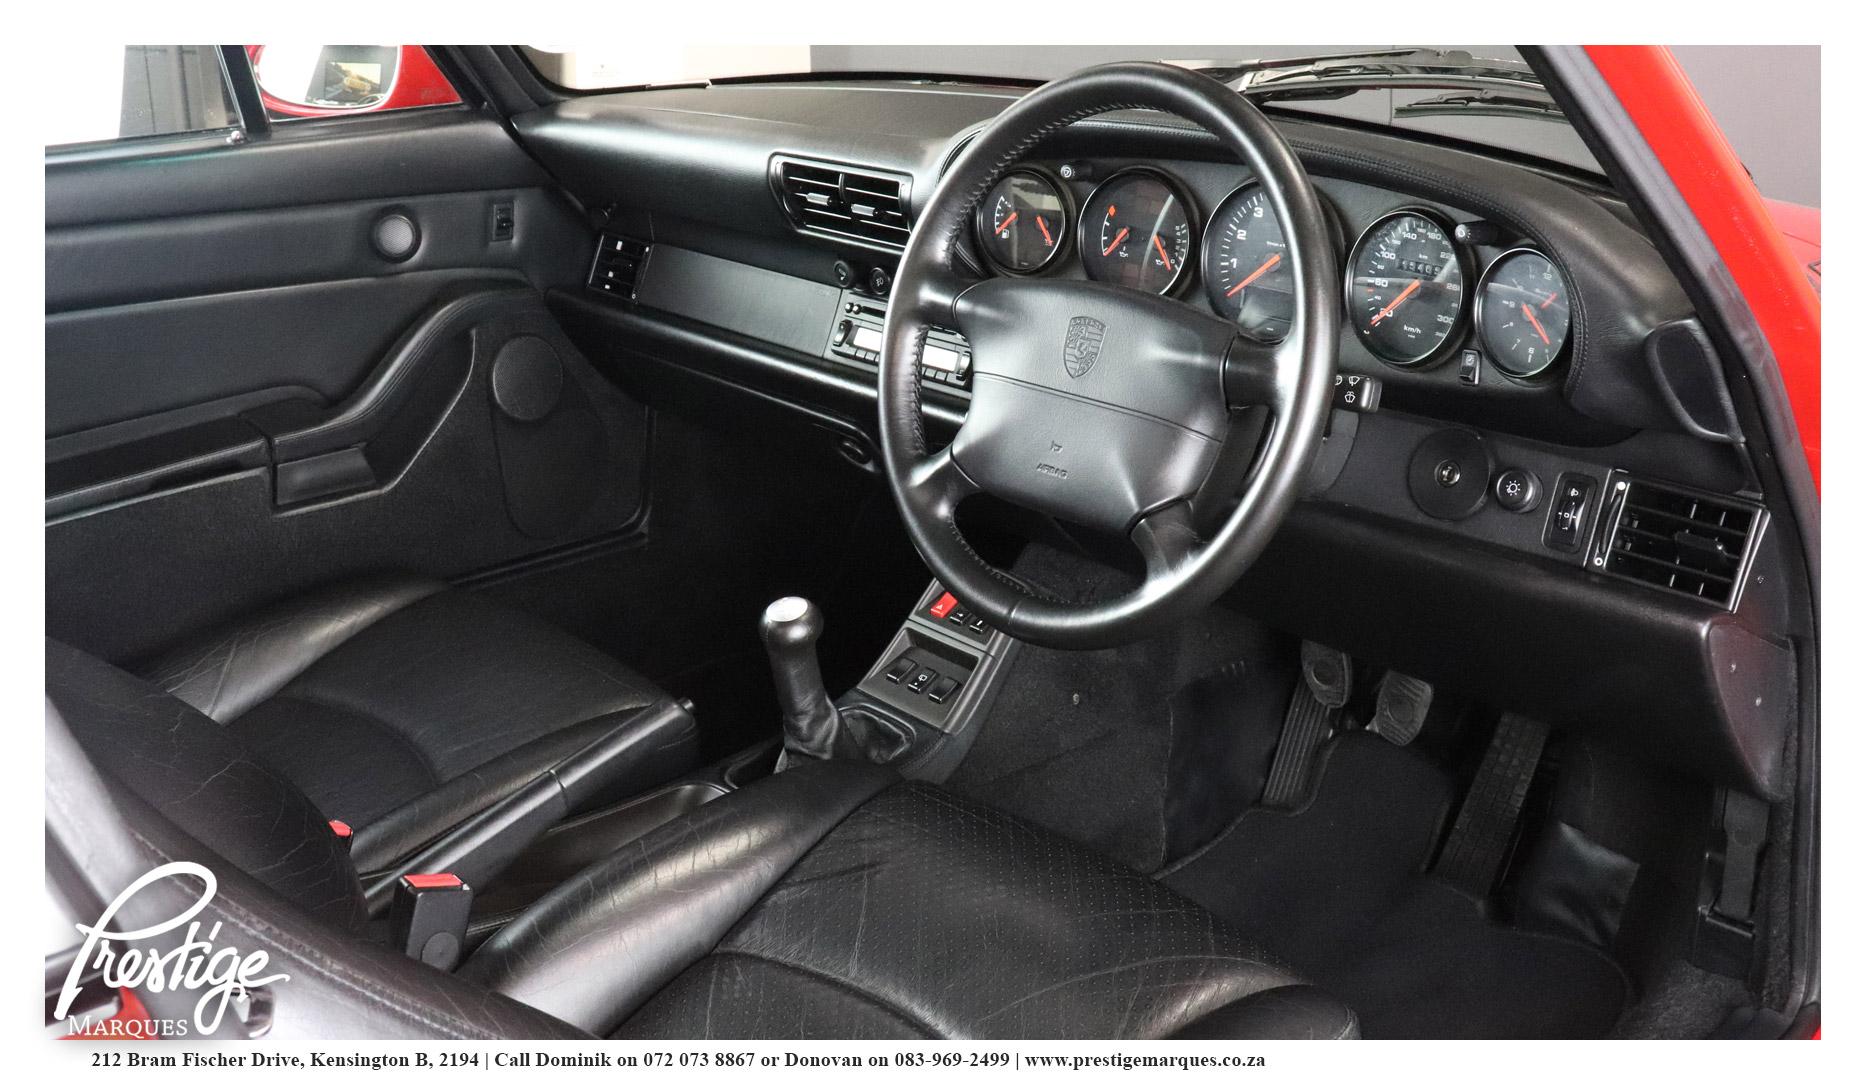 Porsche-911-993-Turbo-Prestige-Marques-Randburg-Sandton-13